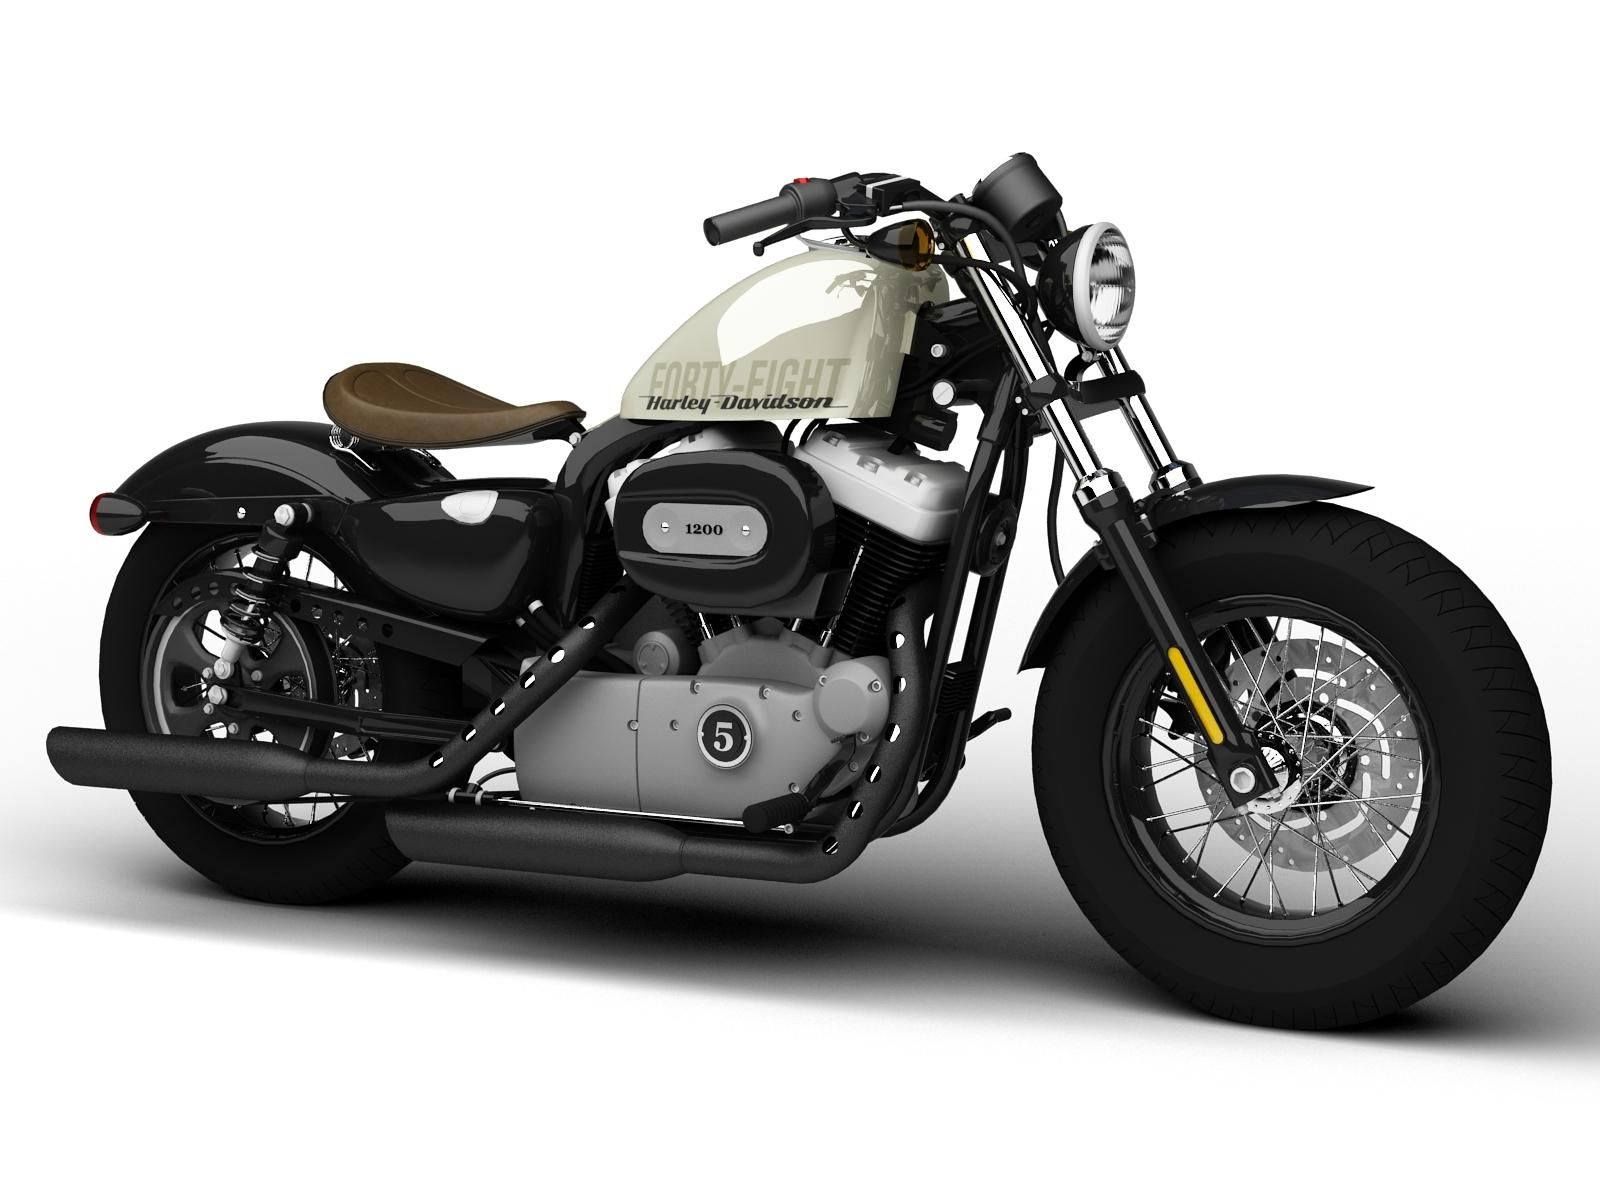 HarleyDavidson XL1200 Sportster FortyEight 2014 3D Model